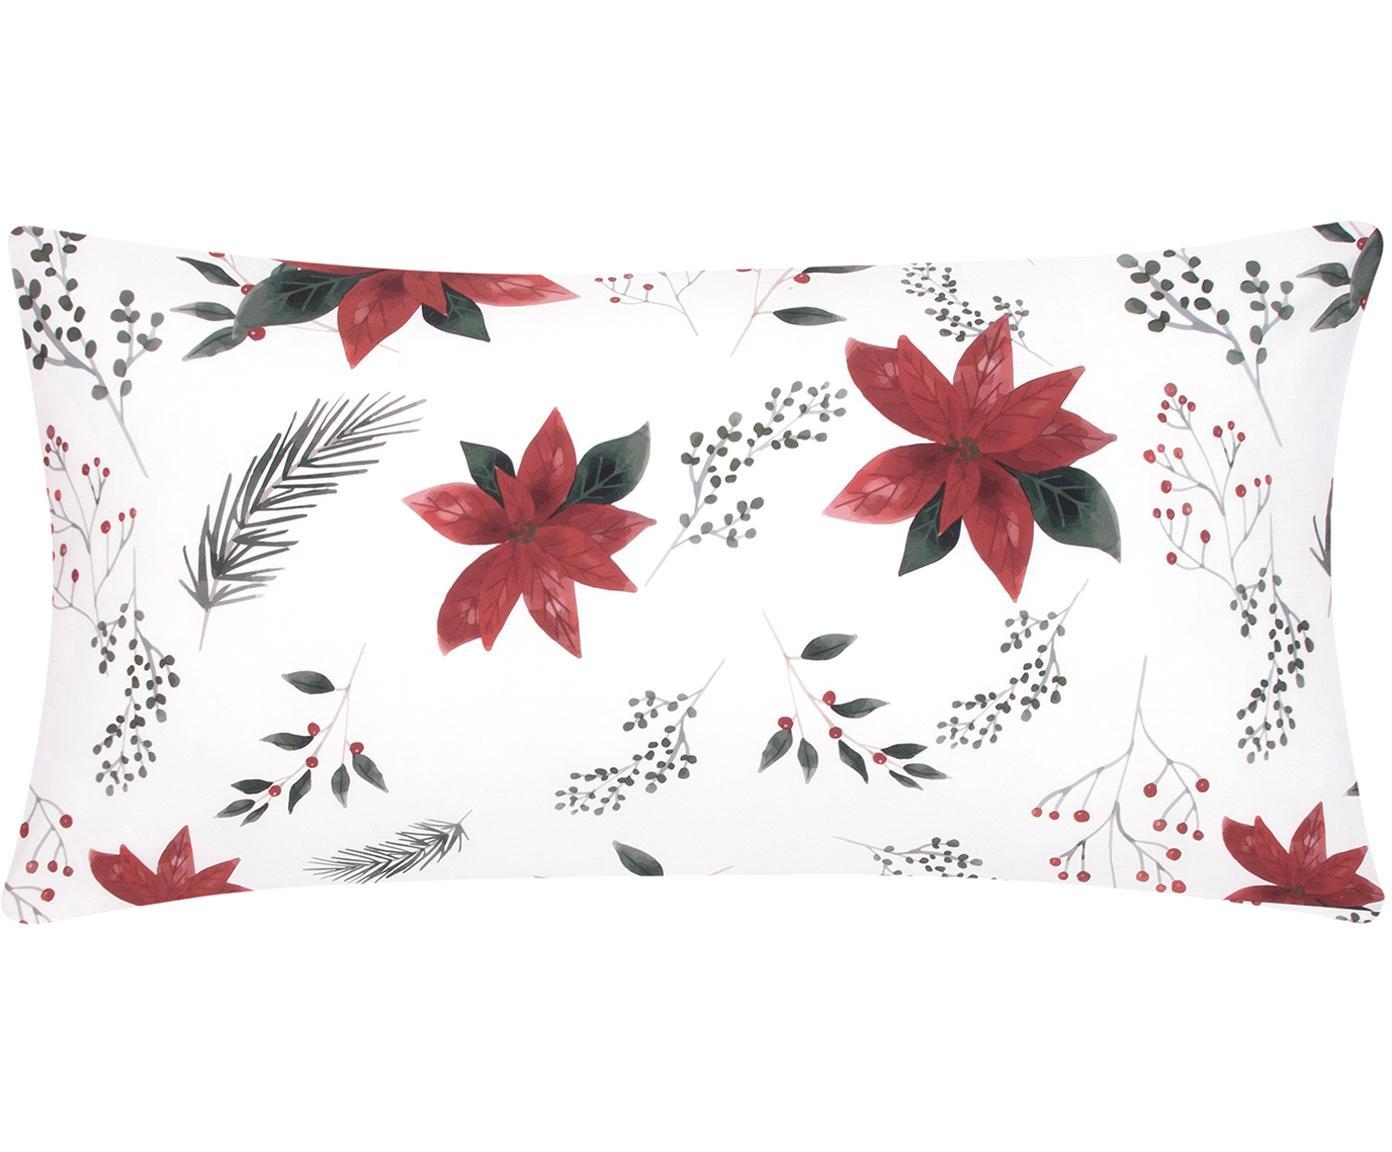 Baumwollperkal-Kissenbezüge Carol mit Amaryllis Print, 2 Stück, Webart: Perkal Perkal ist ein fei, Weiß, Rot, Grün, 40 x 80 cm